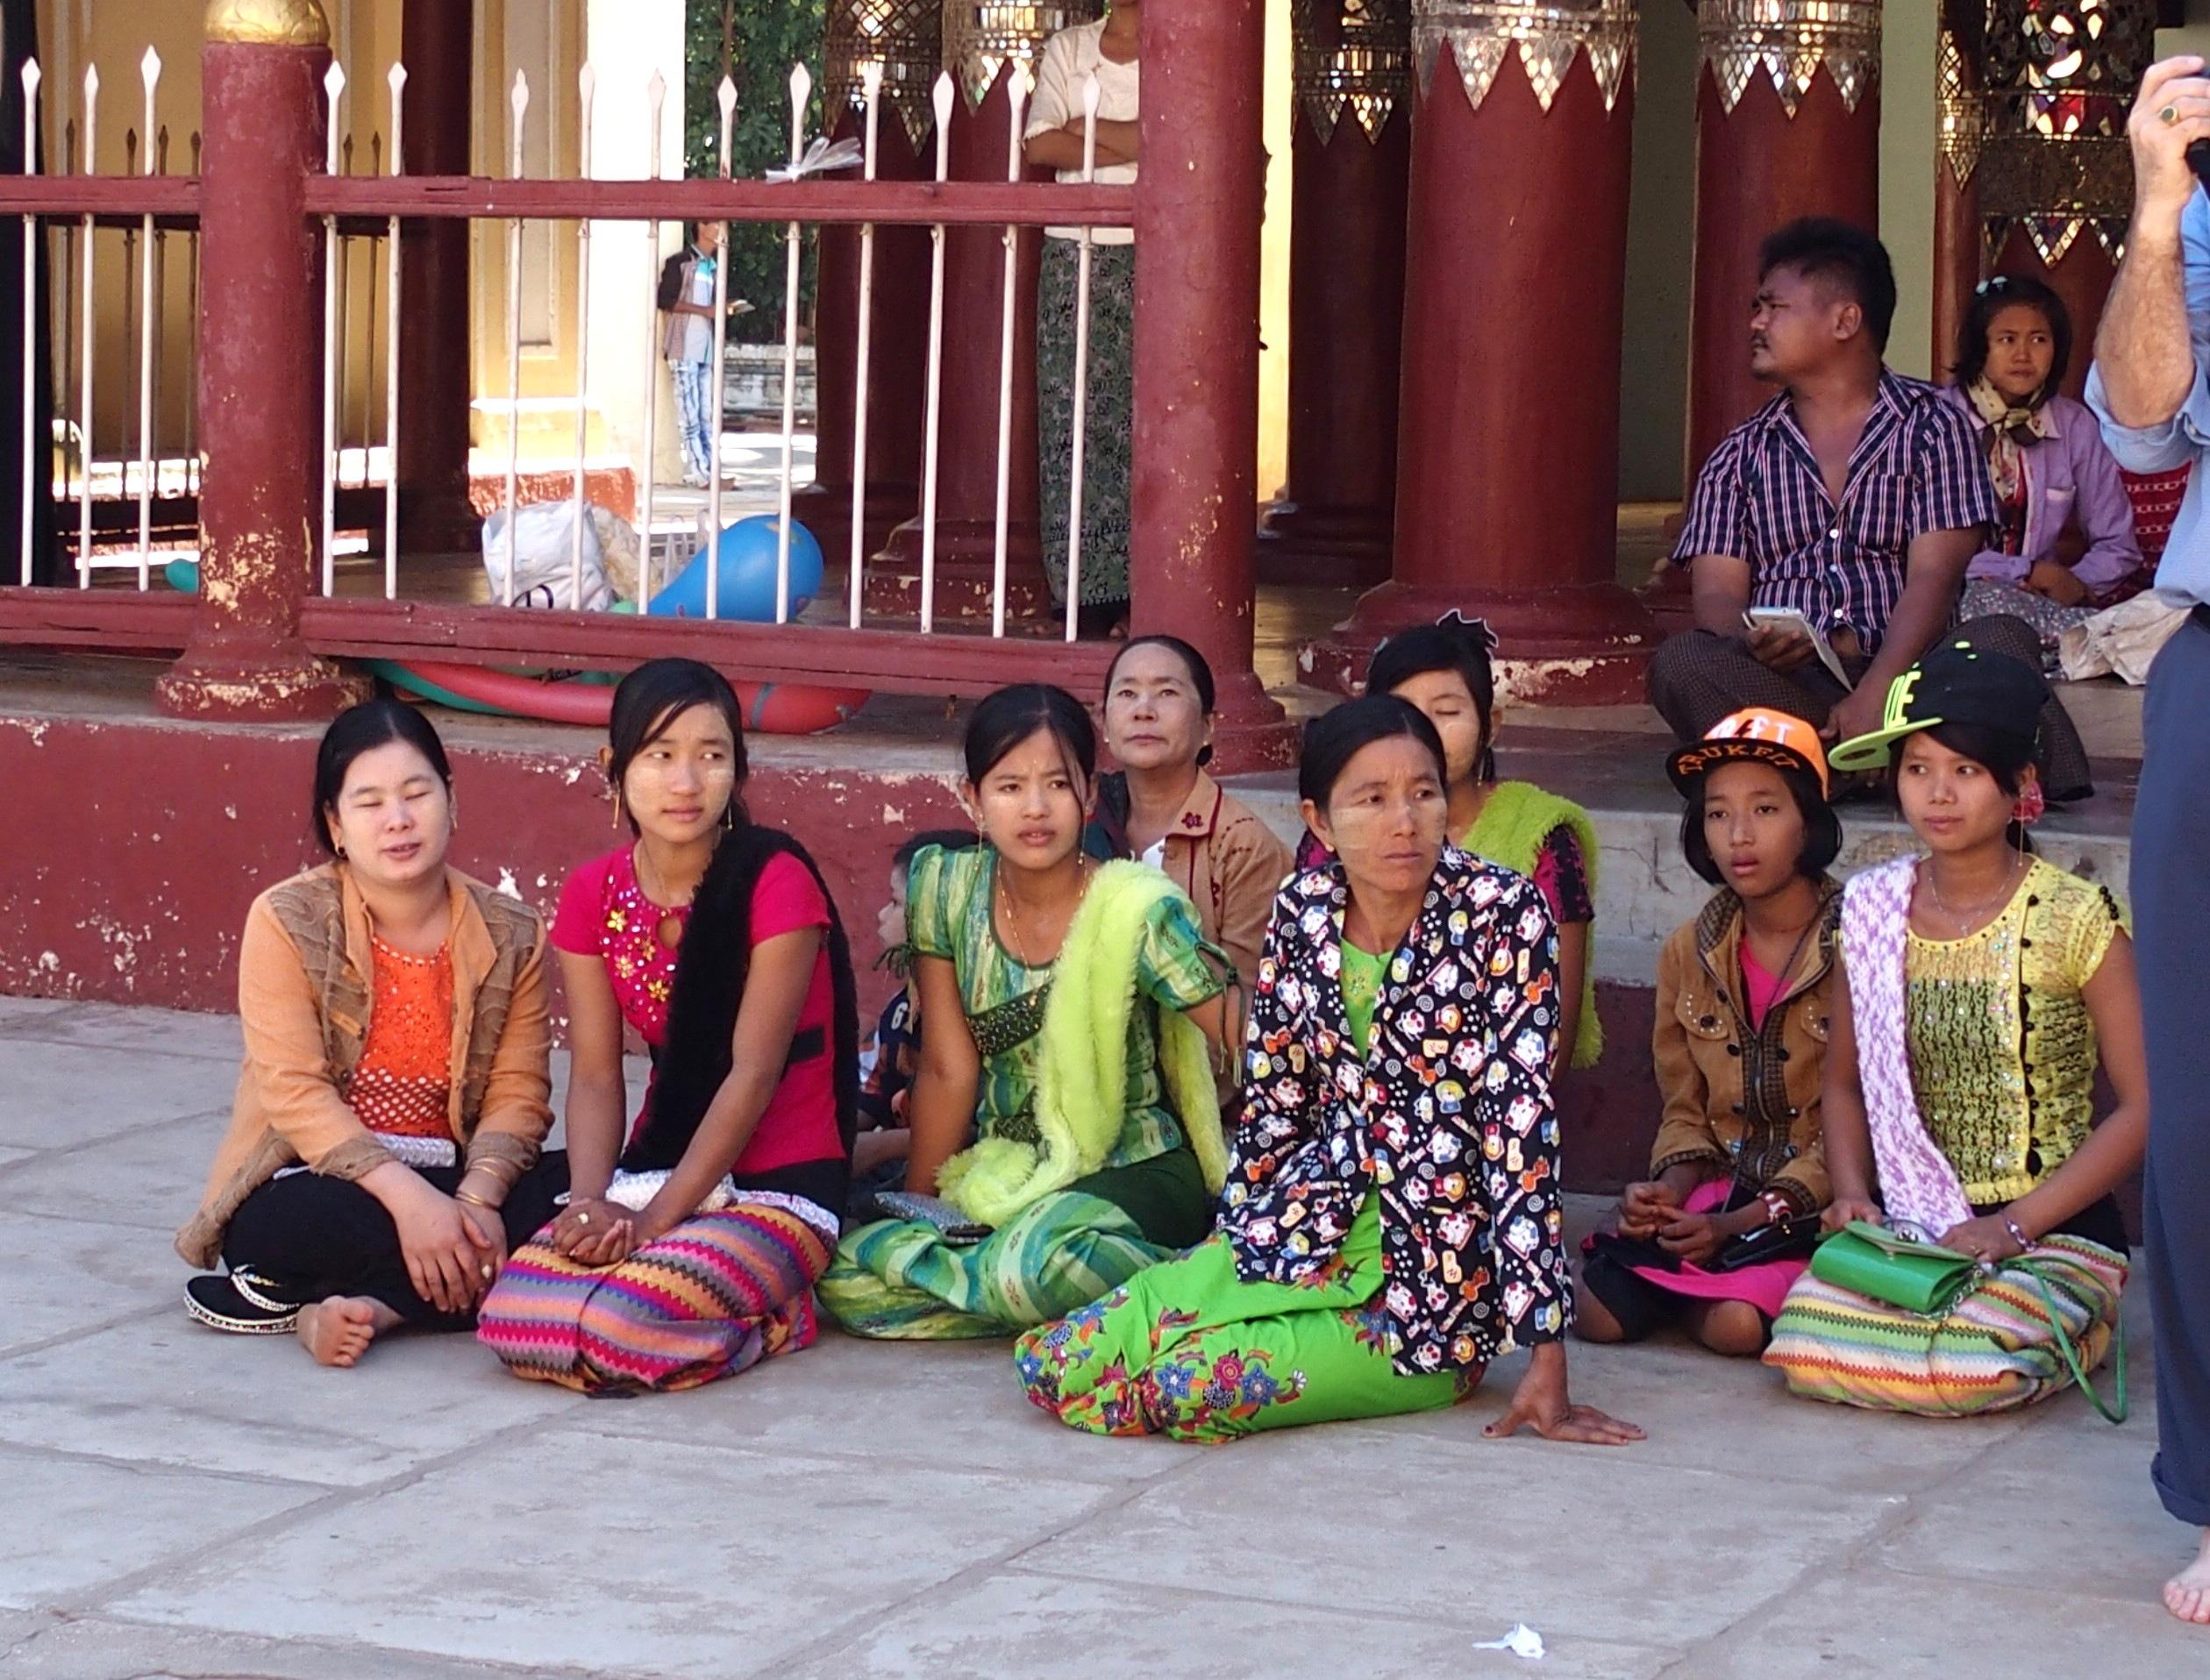 Femmes-à-la-pagode-Shwezigon-Bagan-Birmanie.